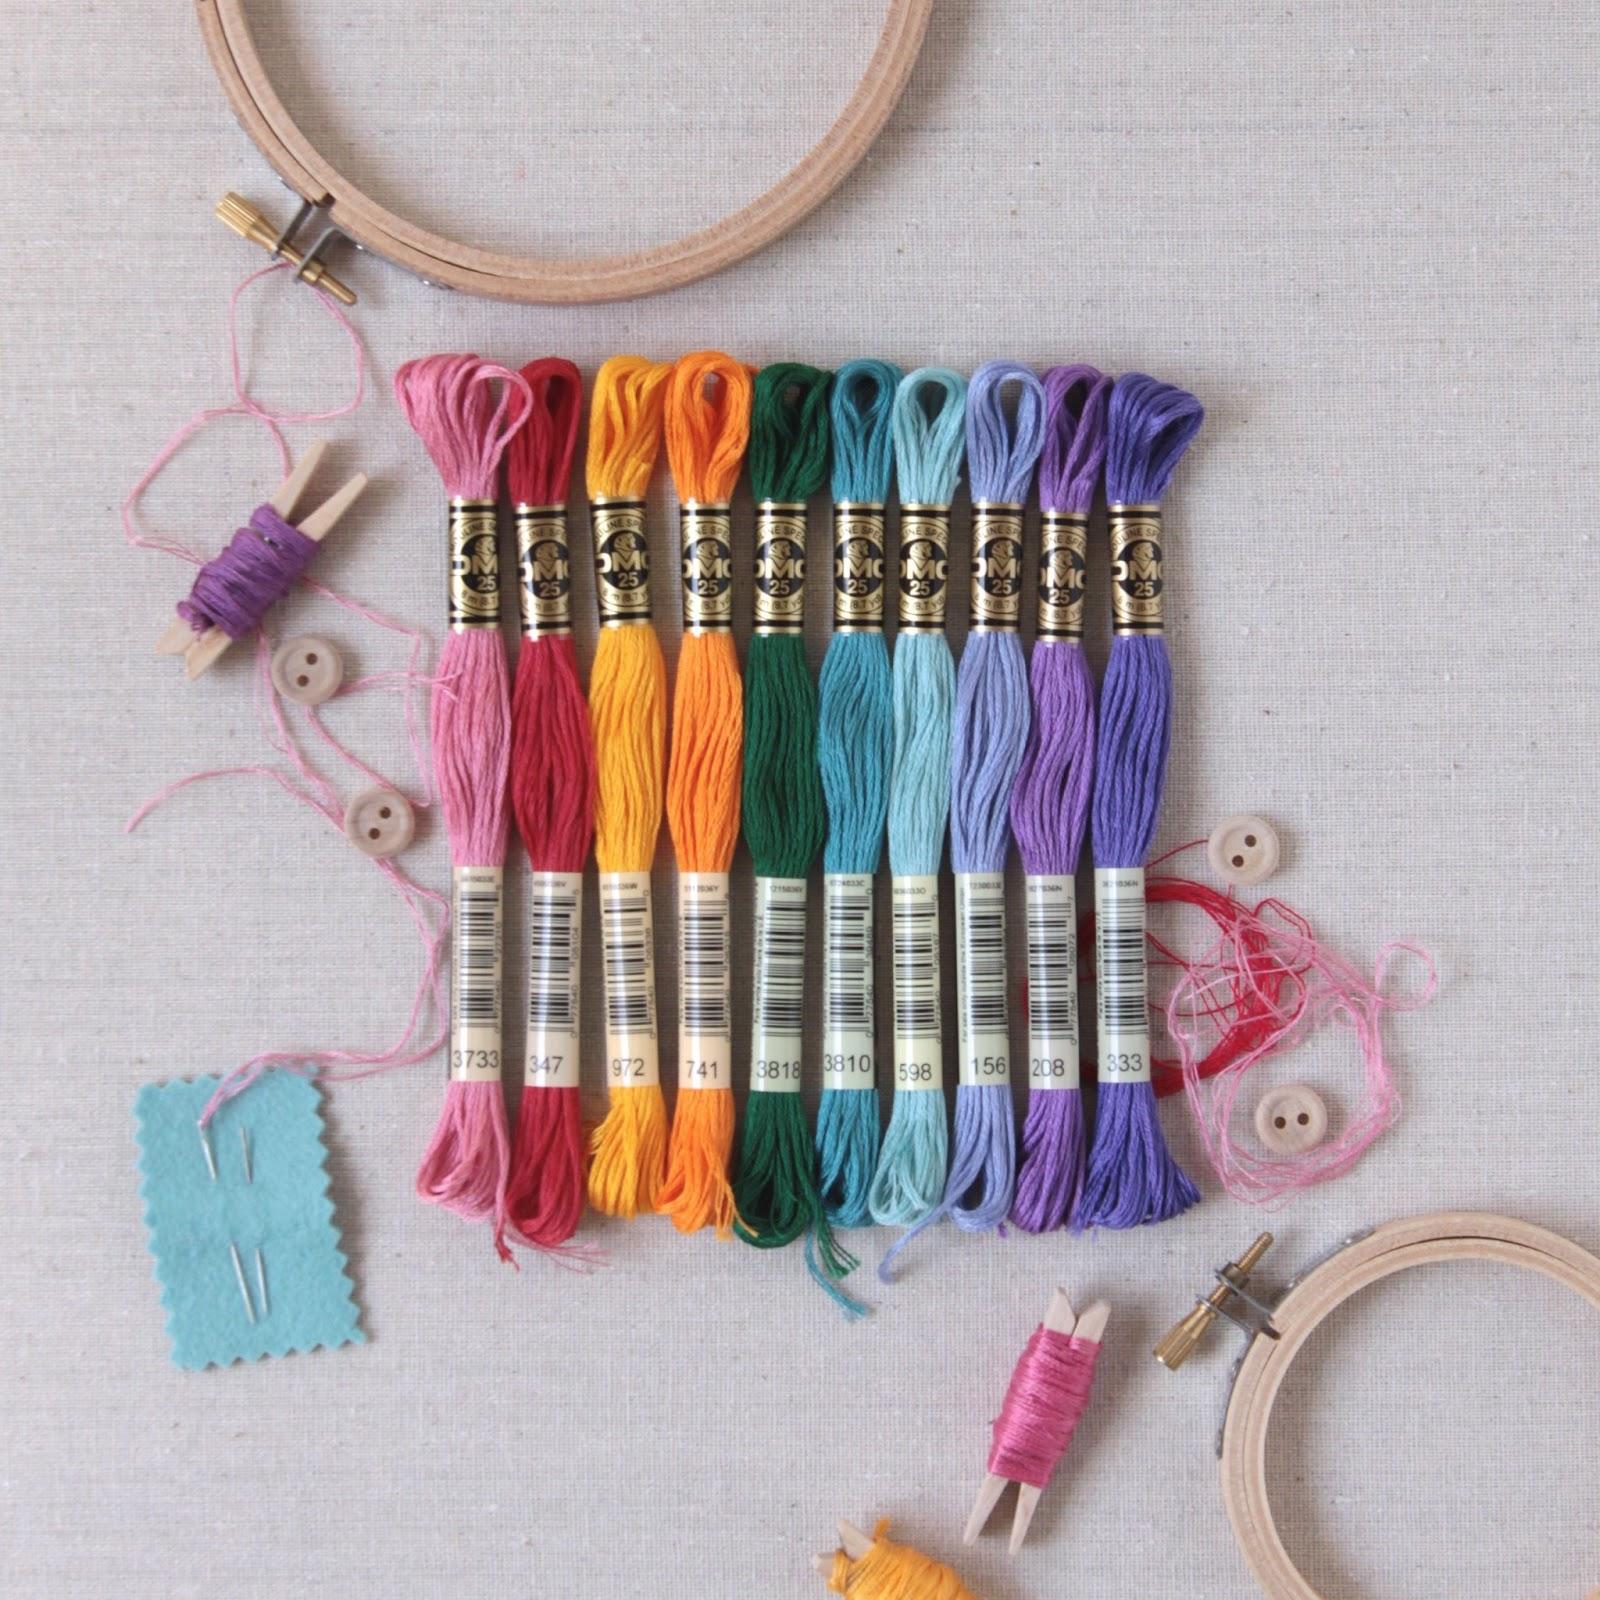 Benzie a fanfare of felt embroidery floss